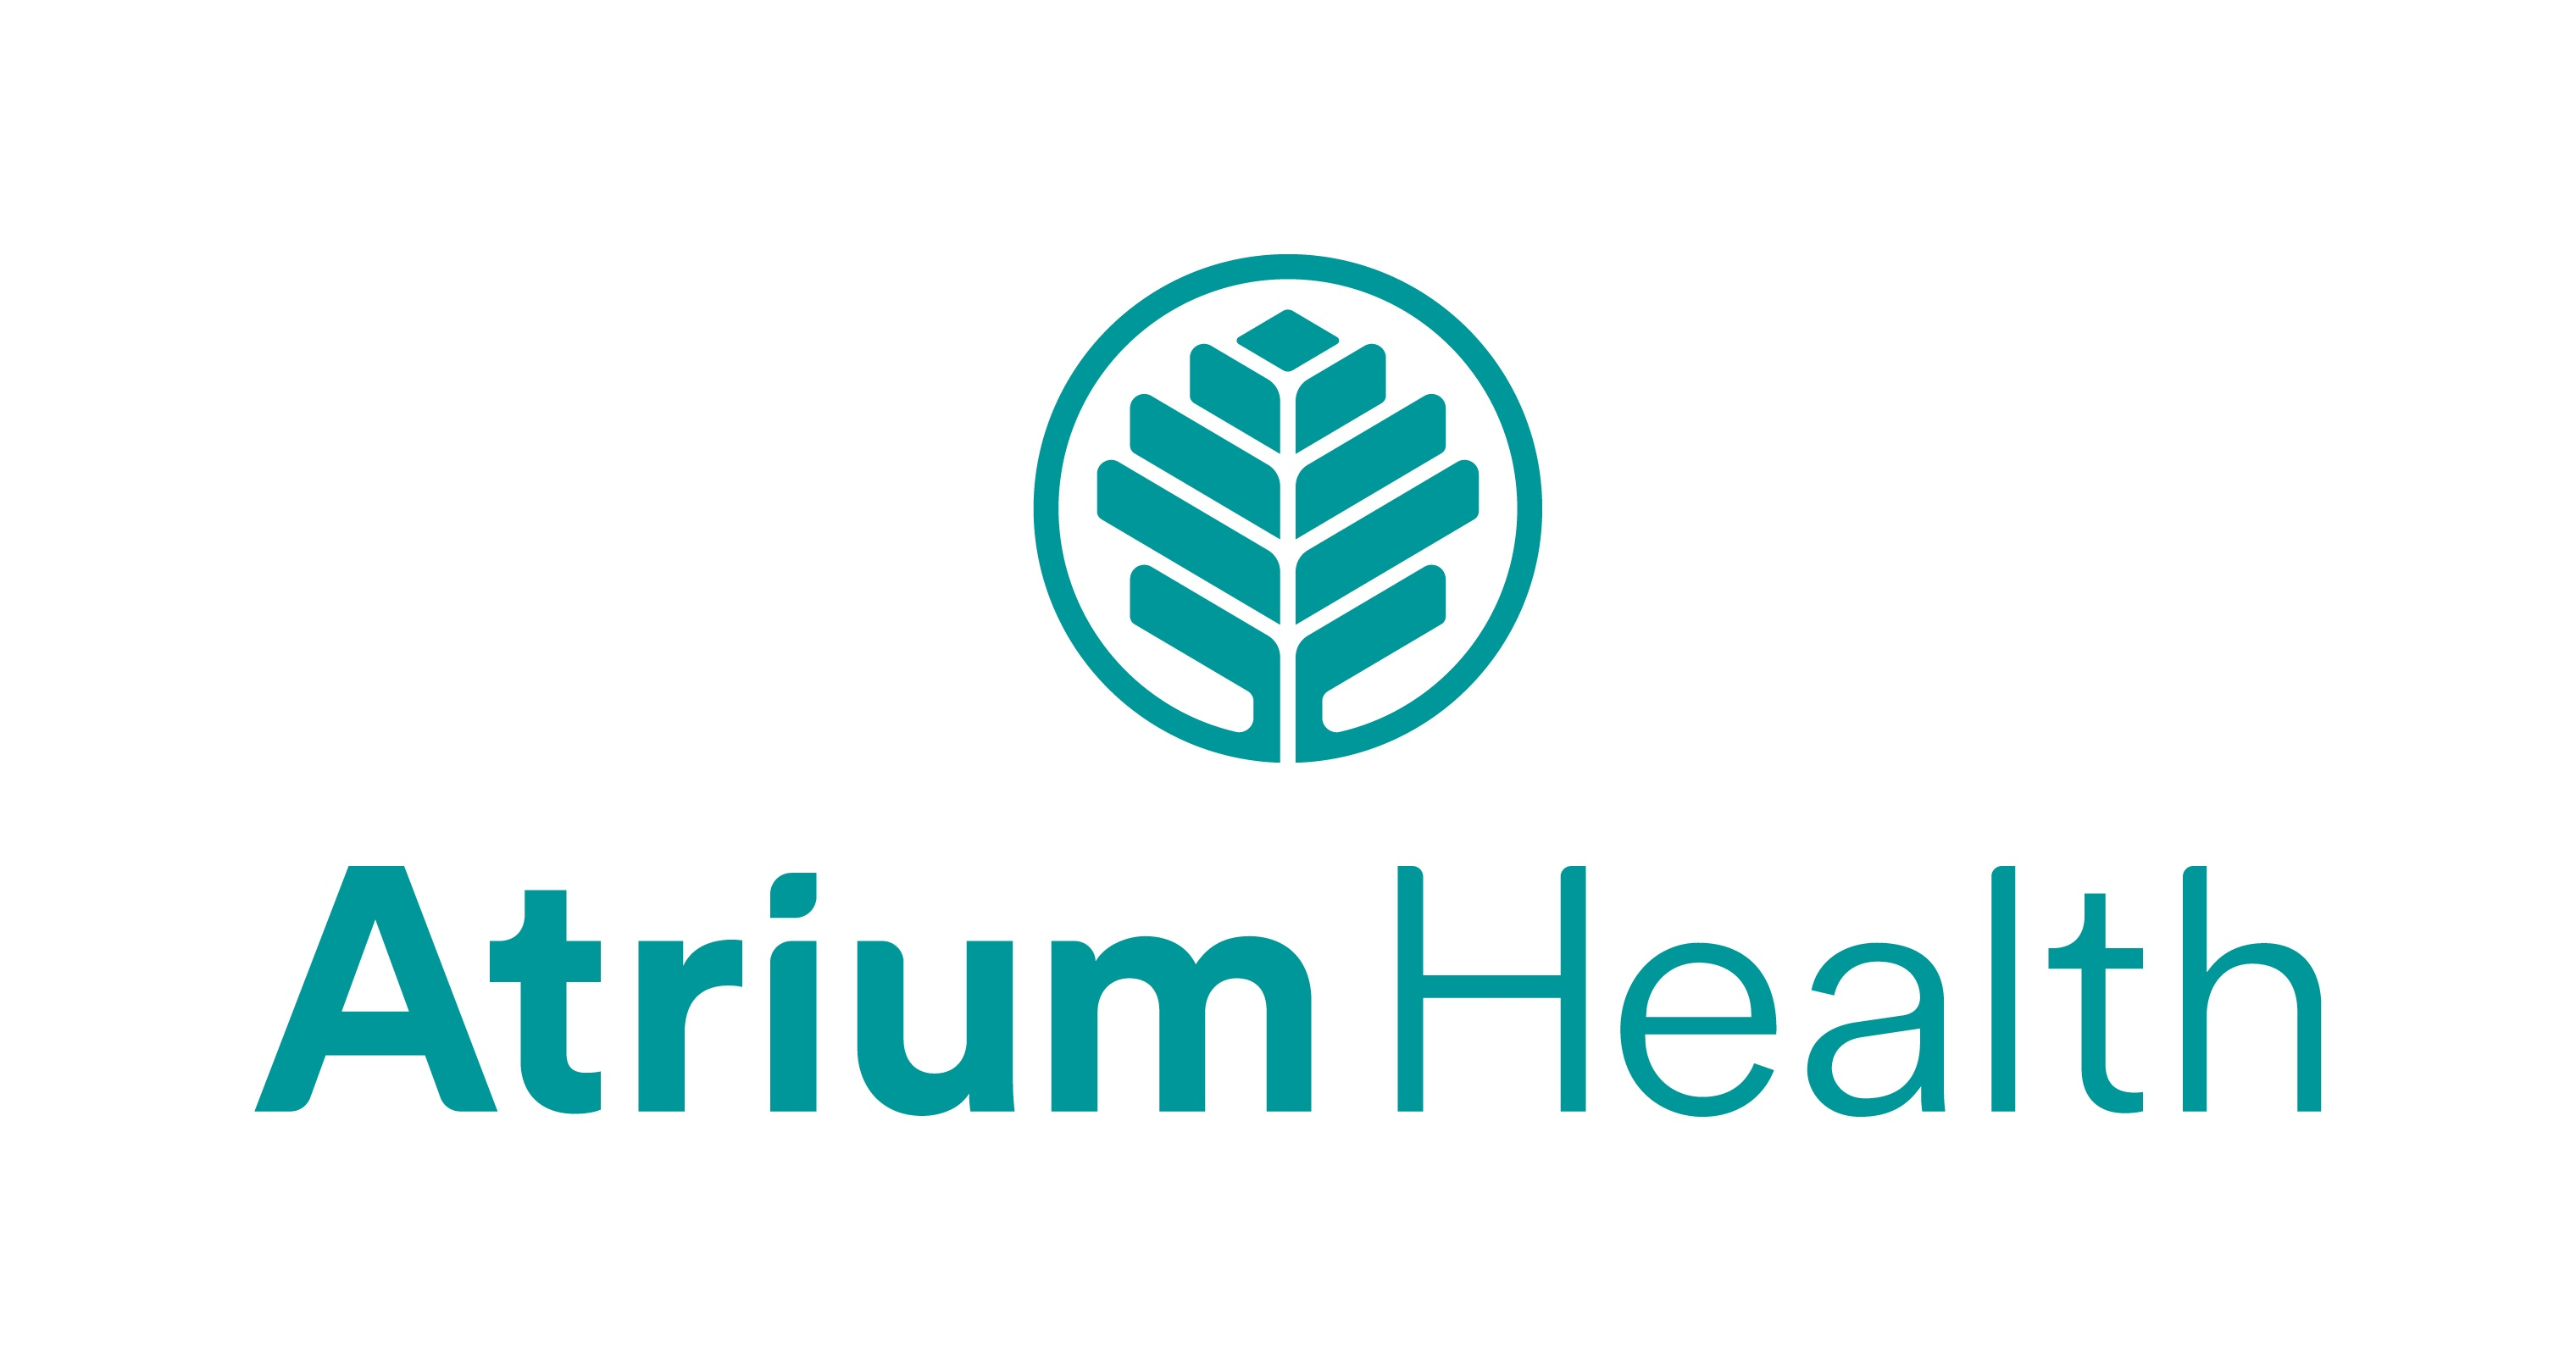 Be Brave with Atrium Health